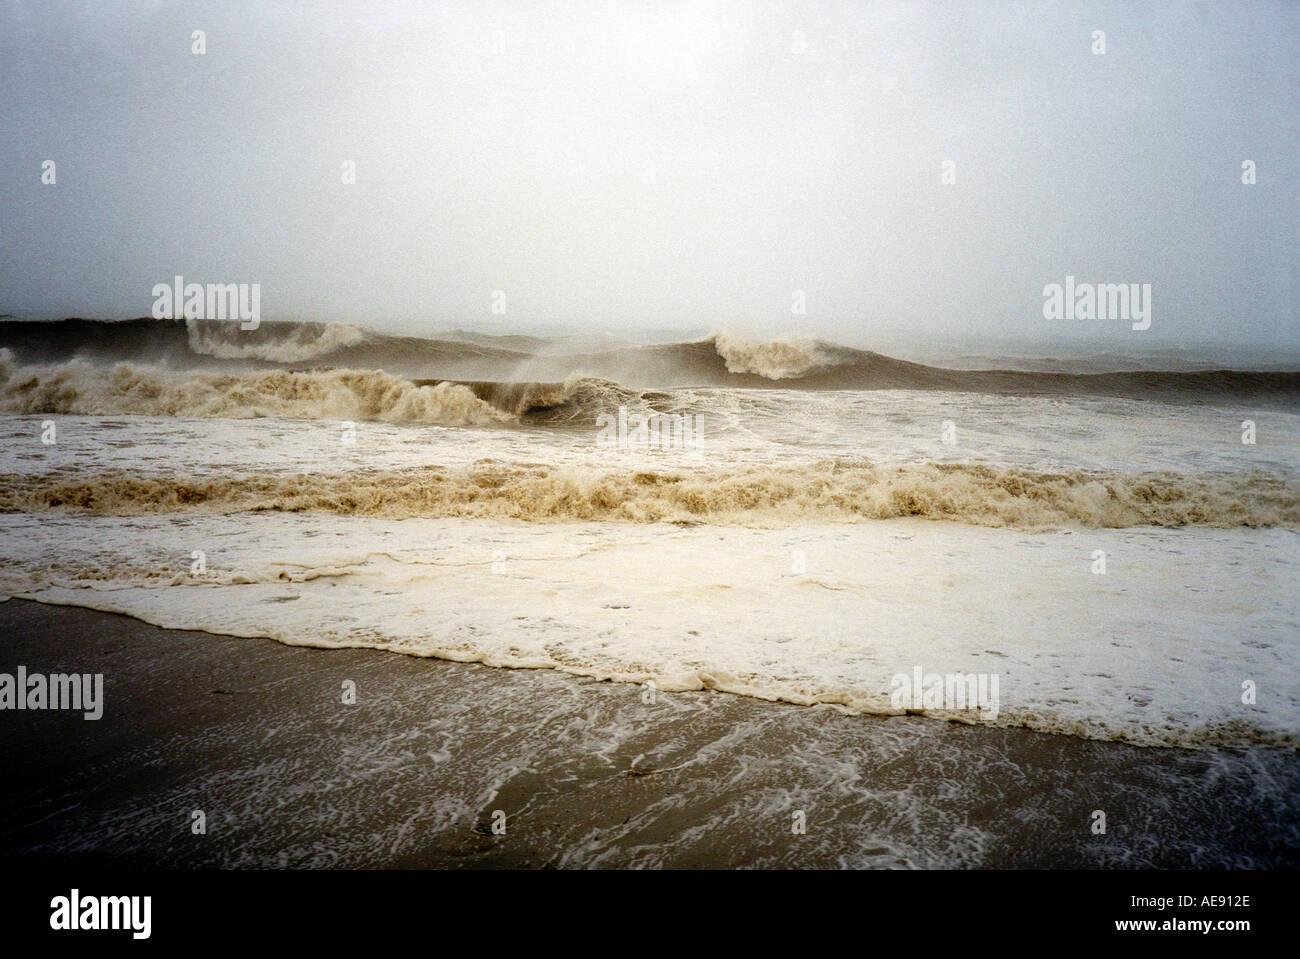 Grobe turbulenten Meer während Hurrikan in Baja California Mexiko Stockbild